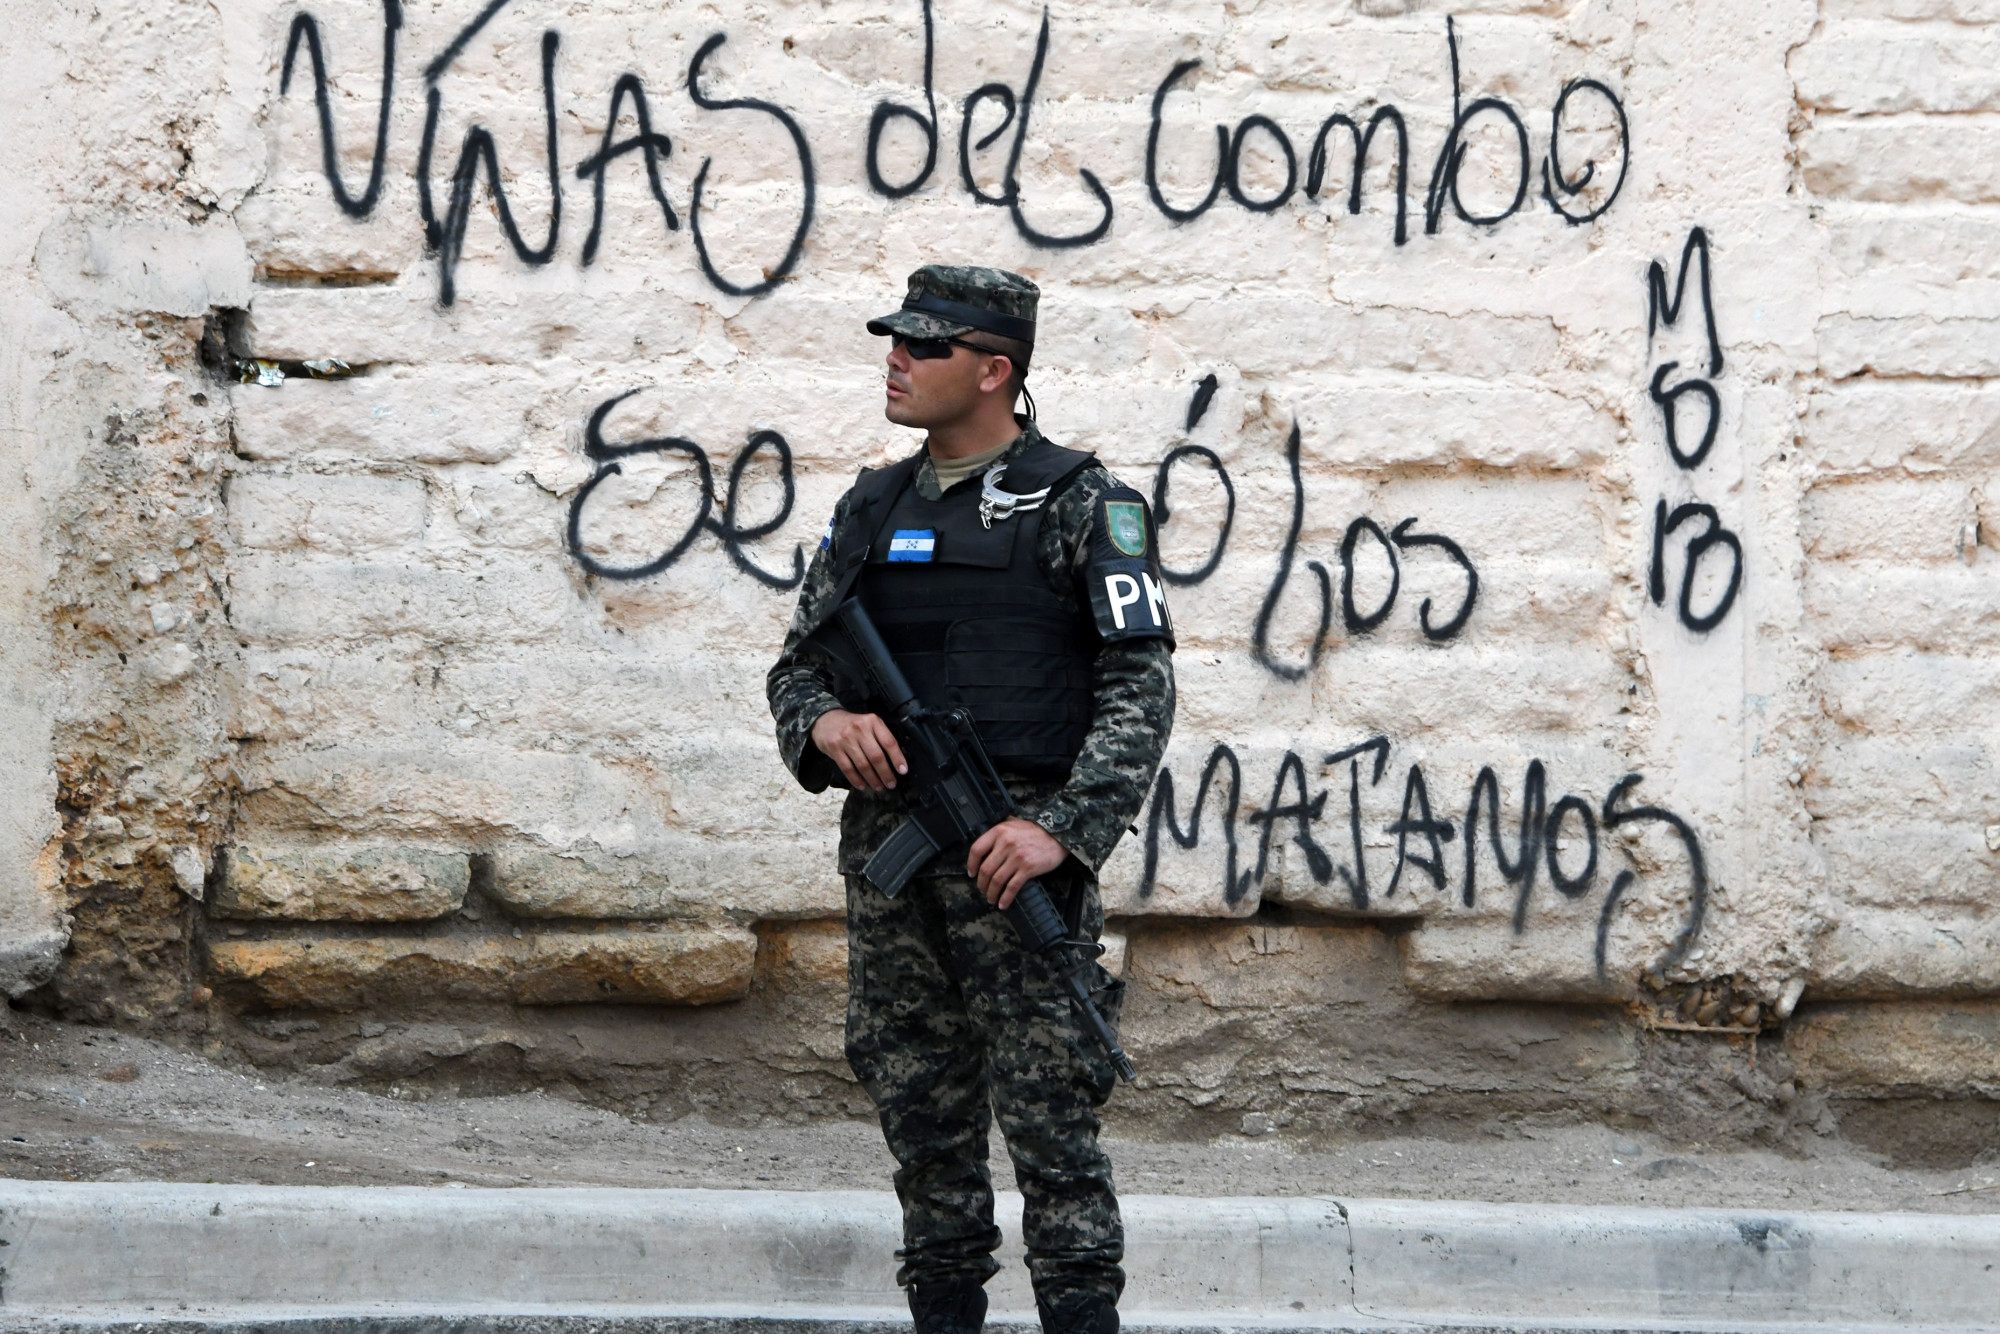 HONDURAS-GANGS-VIOLENCE